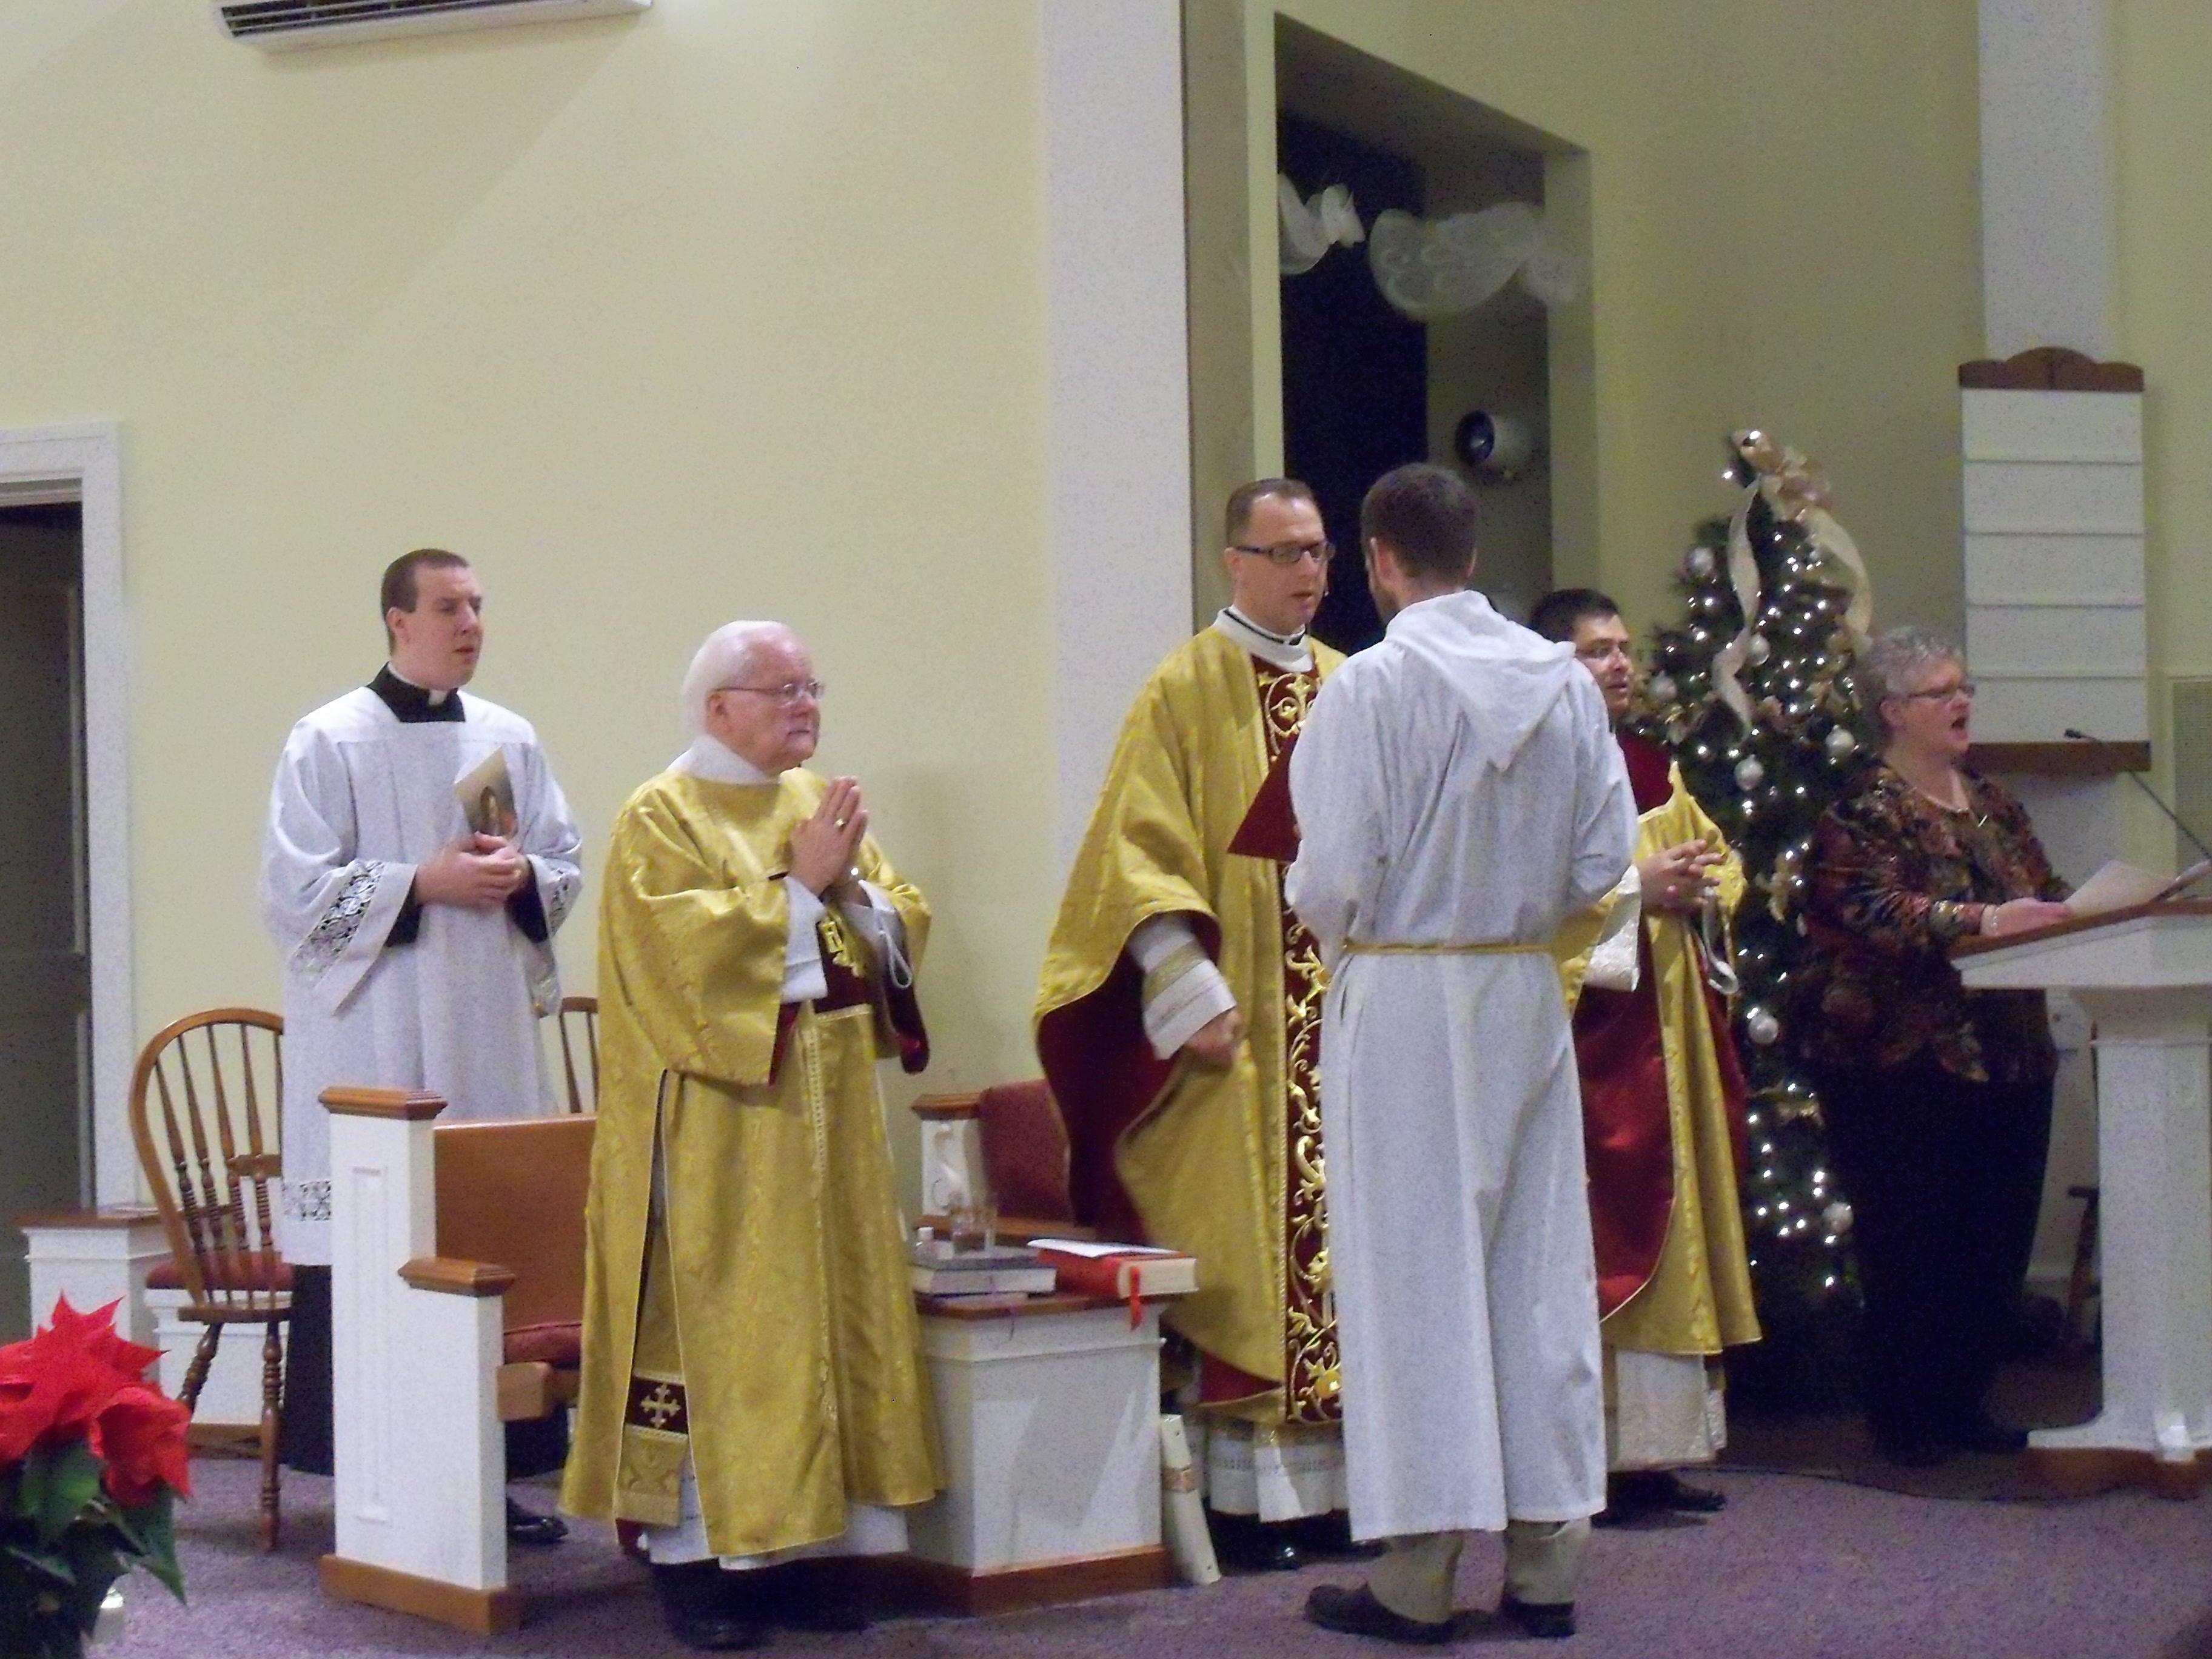 St. John the Evangelist begins 175th anniversary year